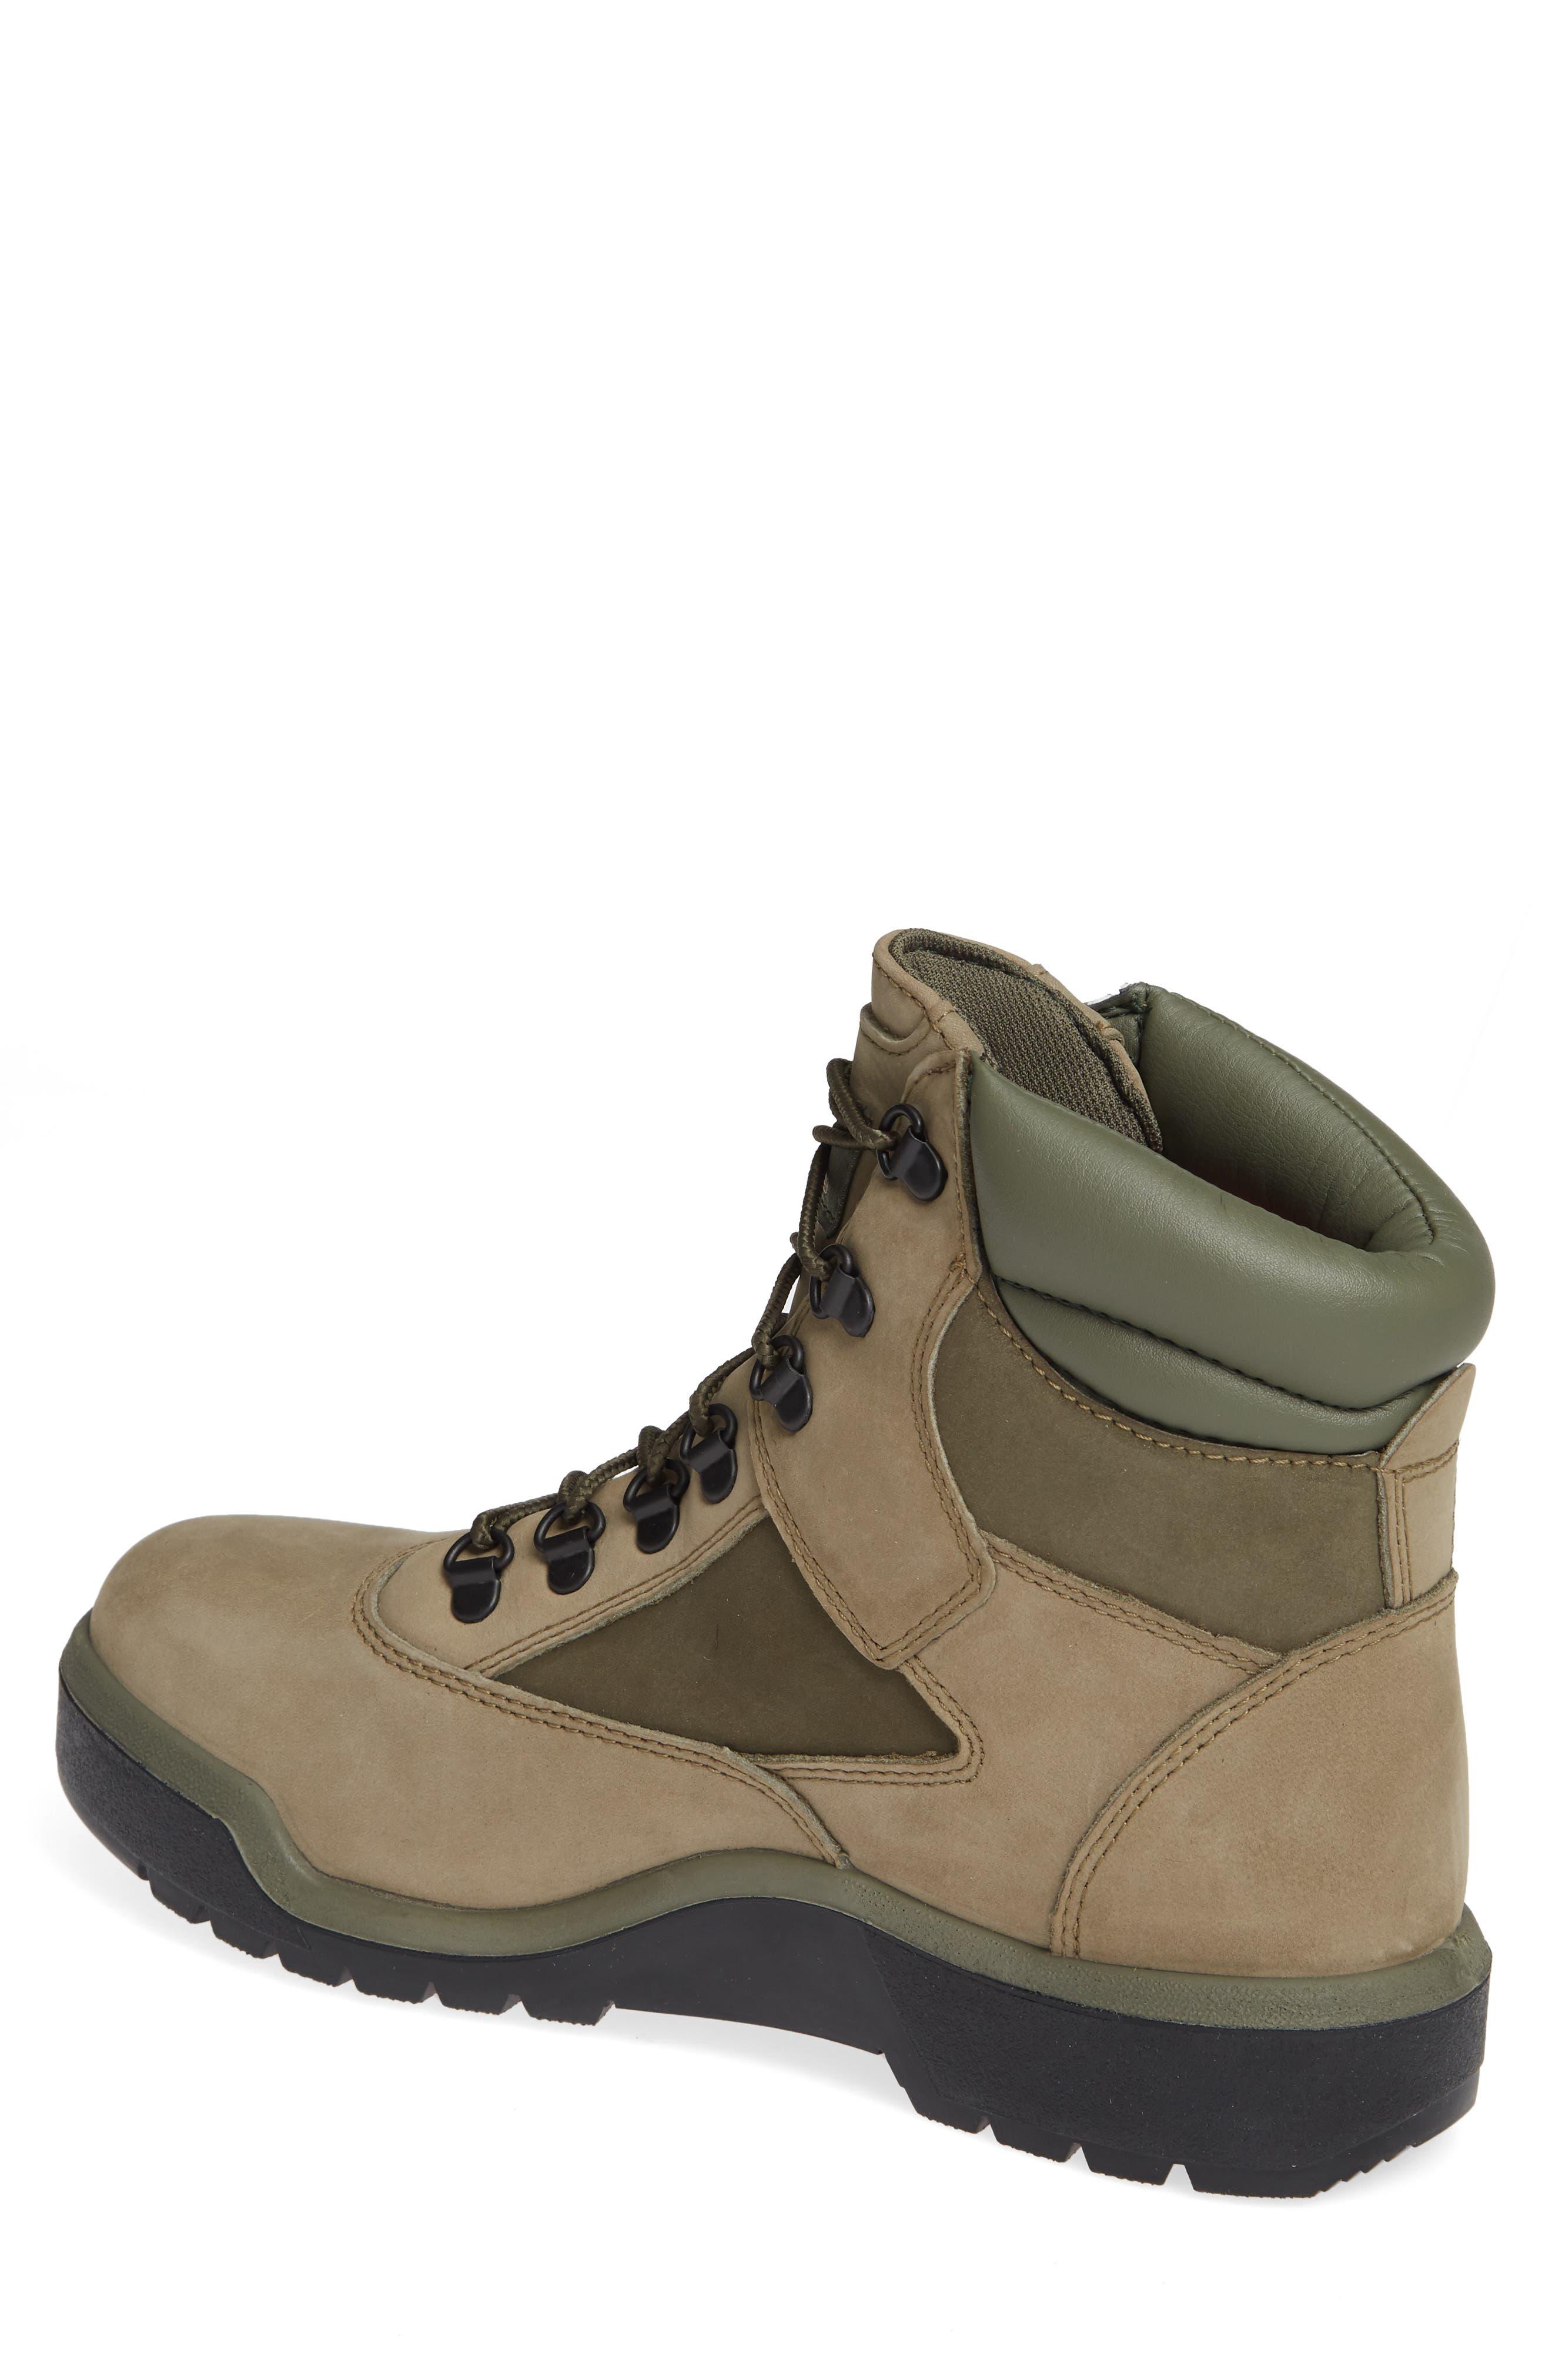 Field Waterproof Boot,                             Alternate thumbnail 2, color,                             280